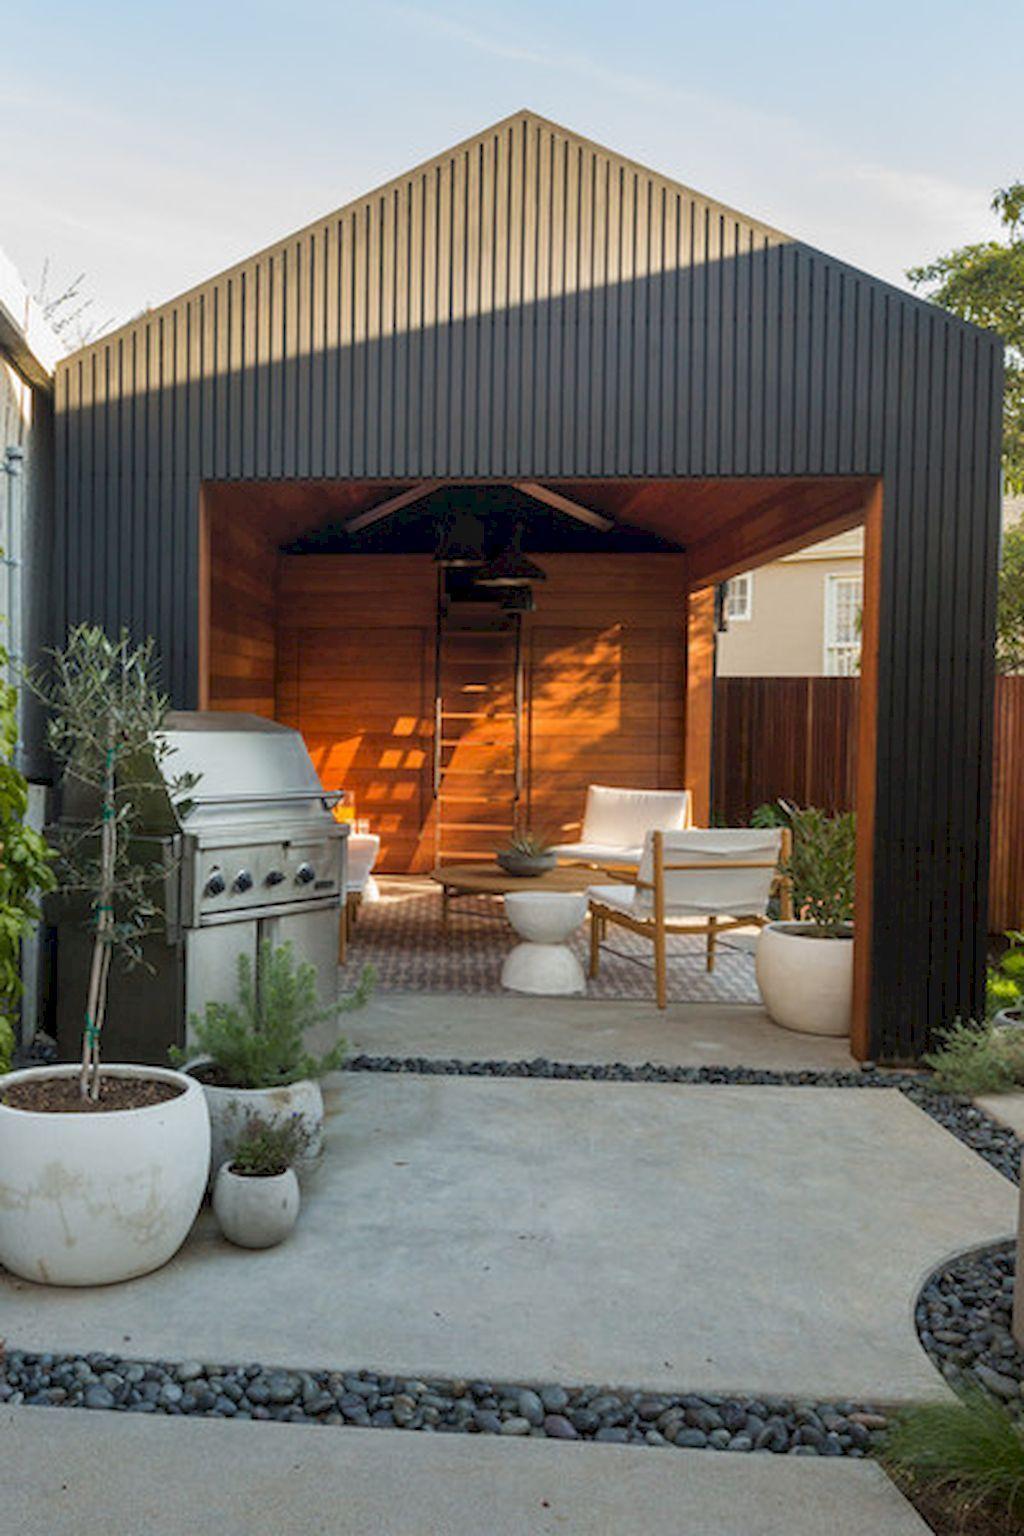 creative diy backyard privacy ideas on a budget in